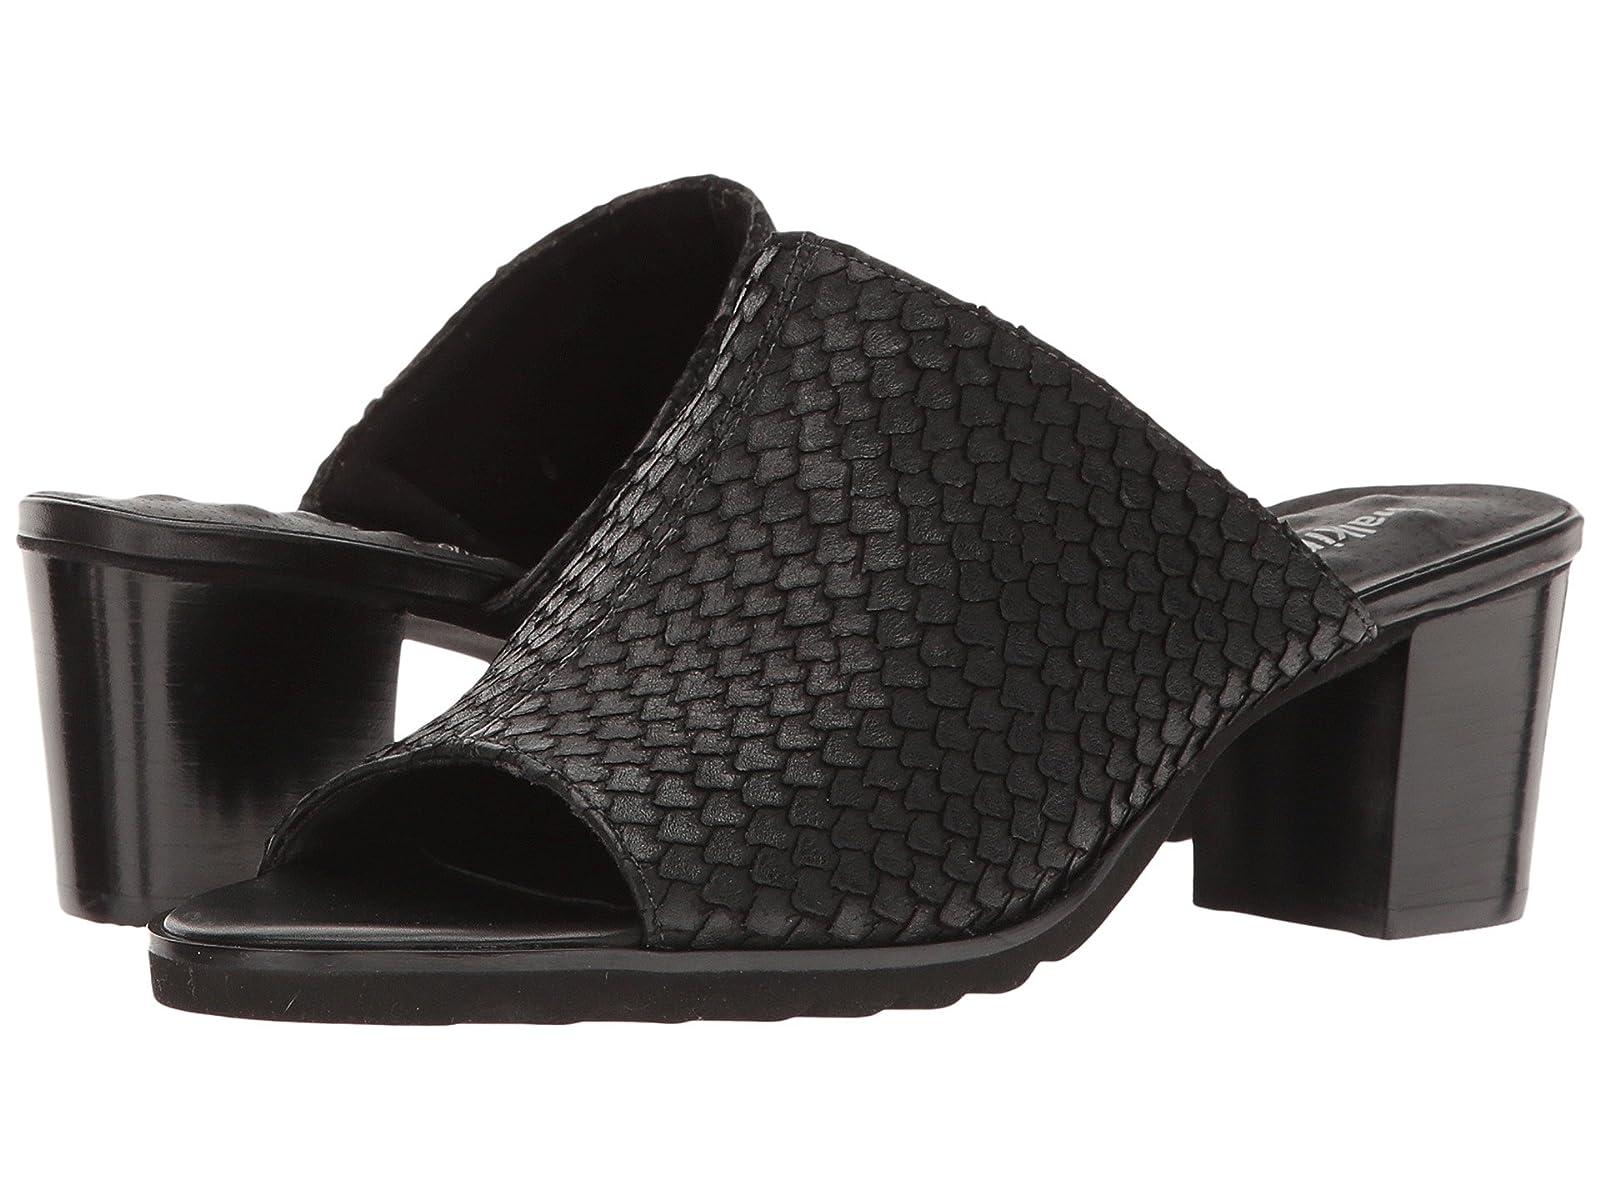 Walking Cradles NiaAtmospheric grades have affordable shoes